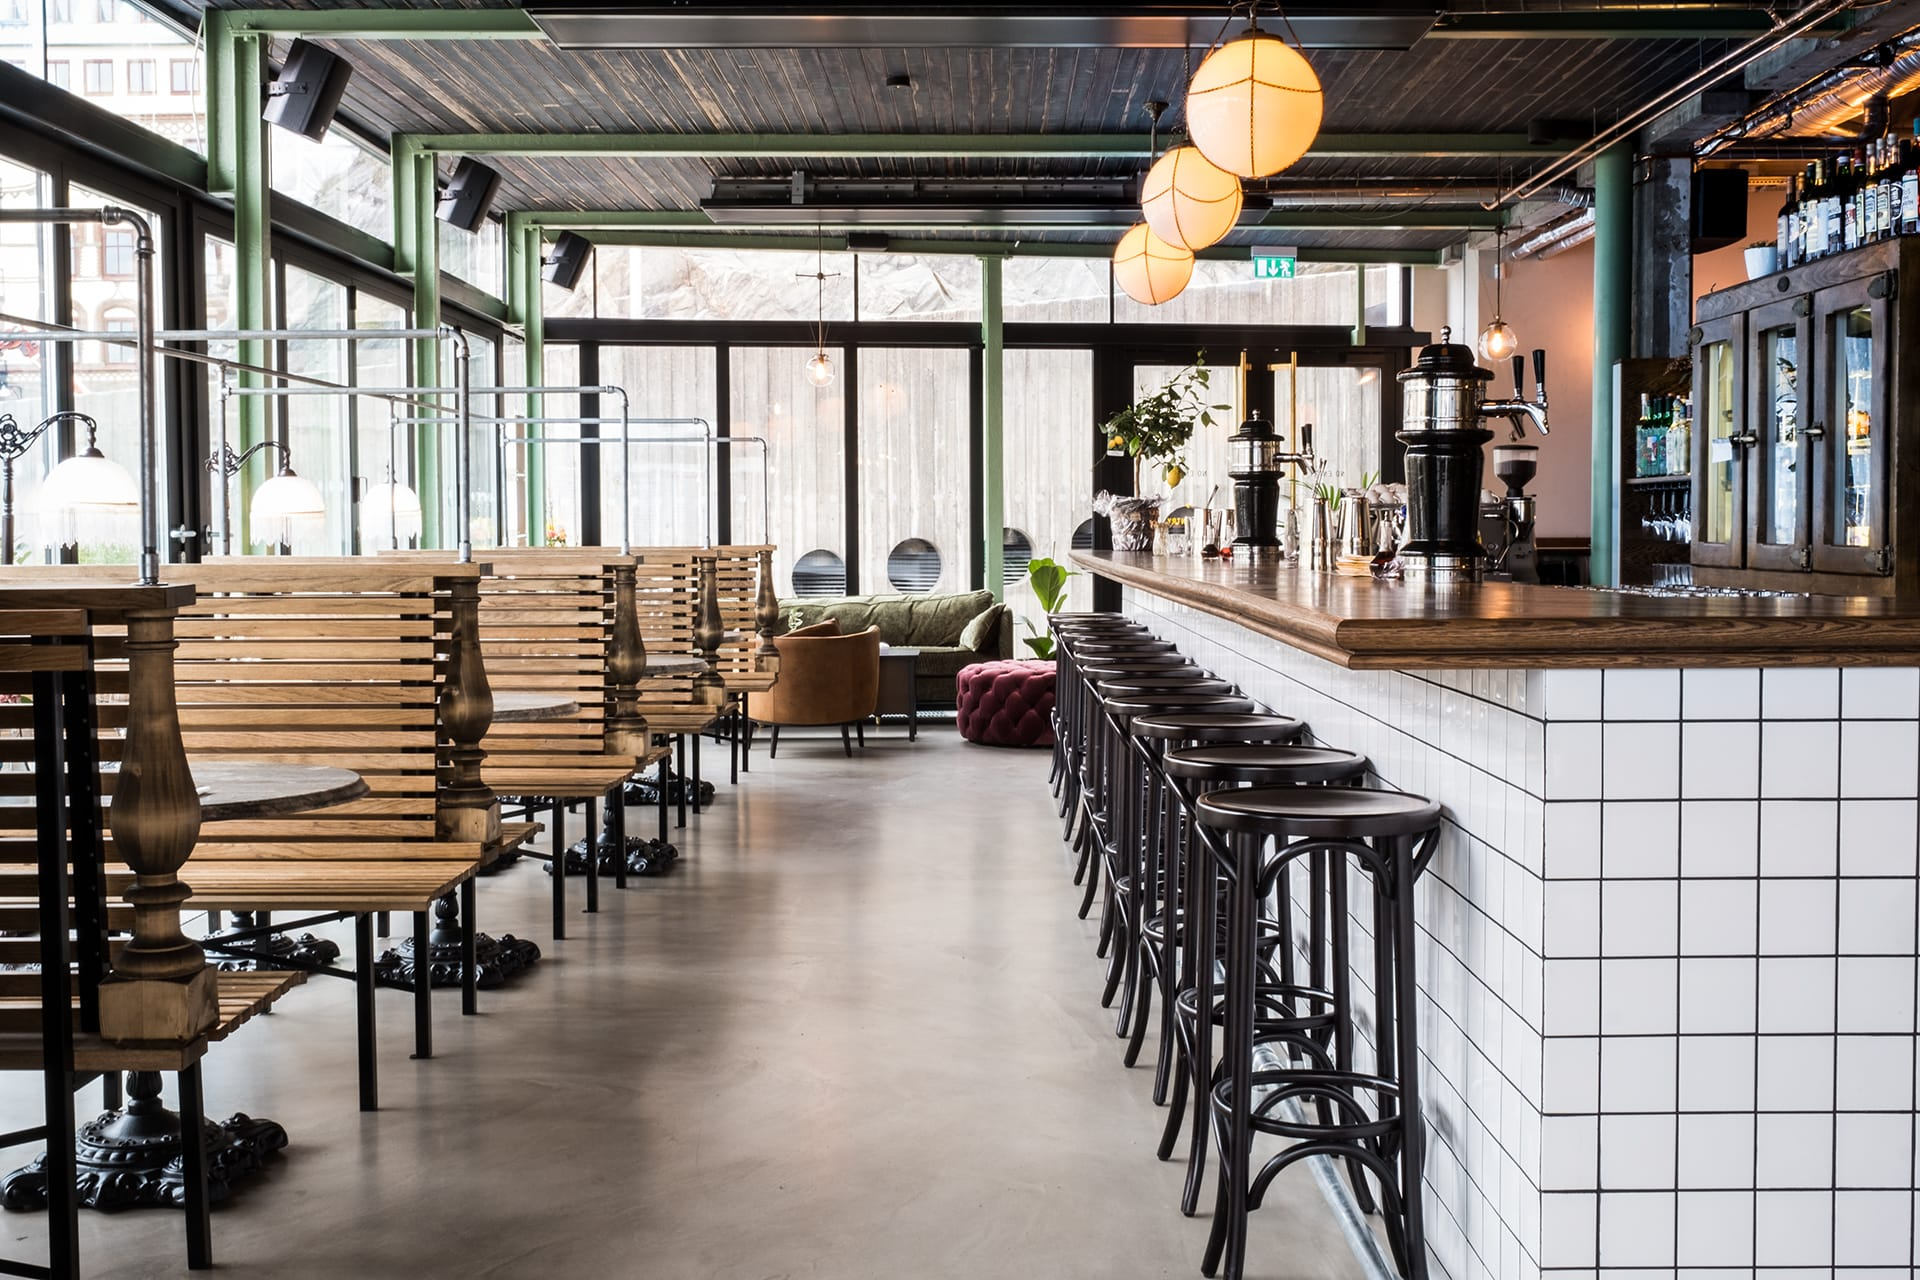 Zamenhof_Cafe_Gazette_Interior_Fotografi_mnecander-7